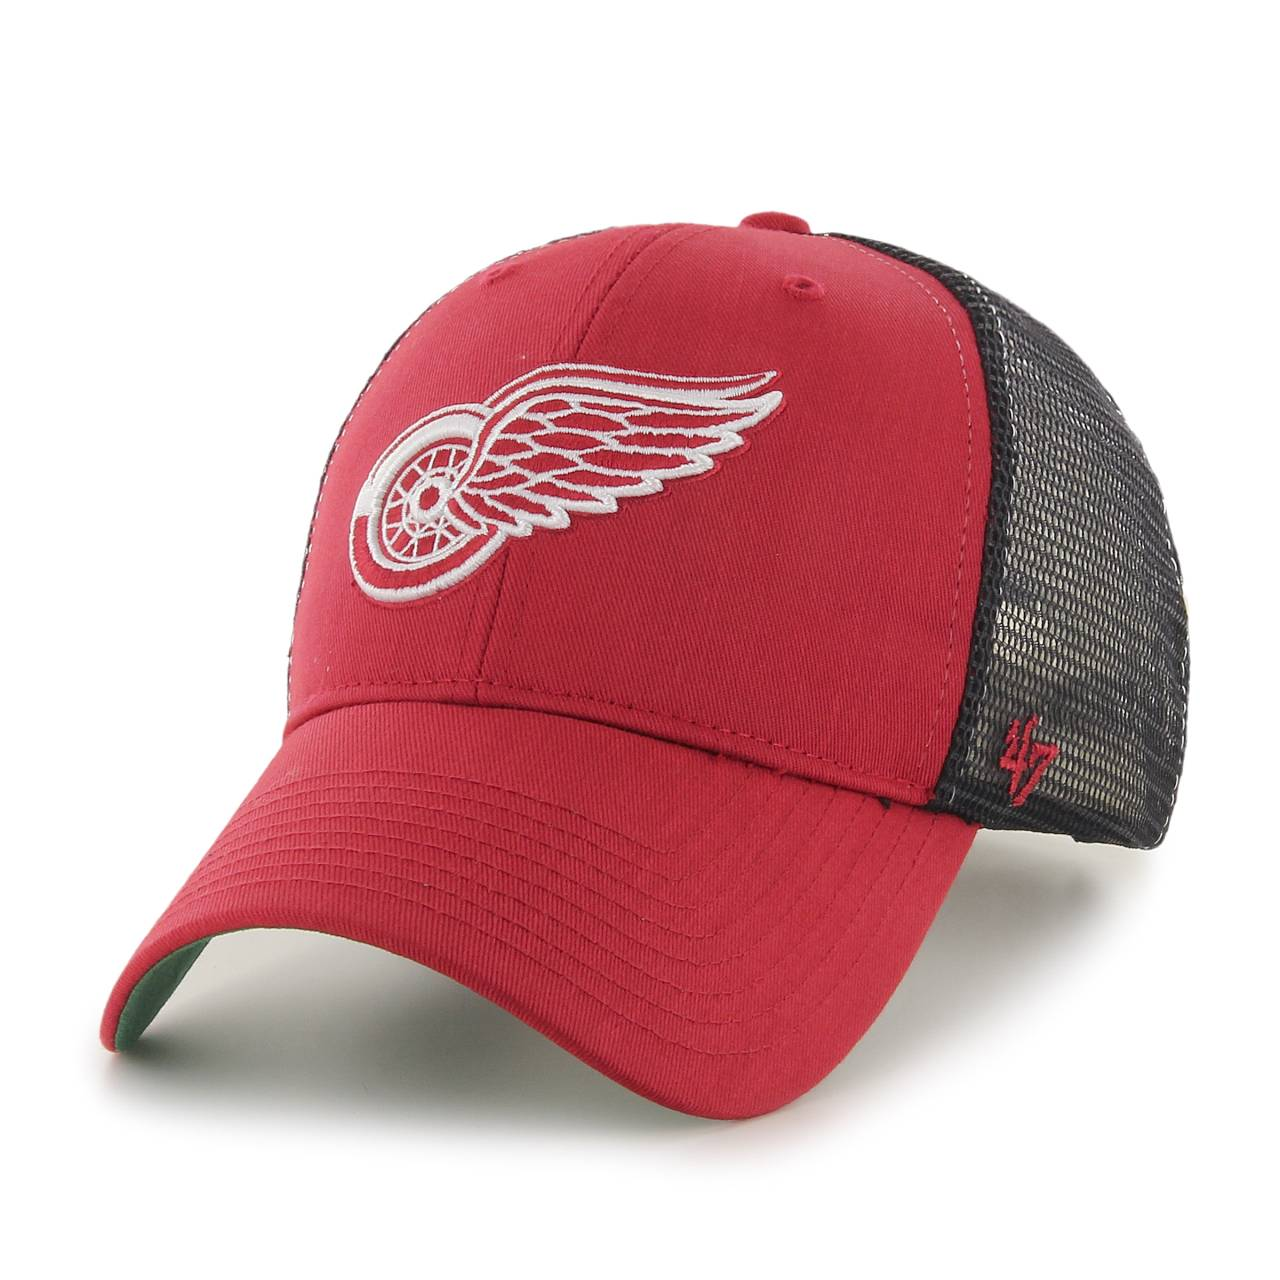 H-BRANS05CTP-RDC NHL DETROIT RED WINGS '47 BRANSON MVP RED CAP